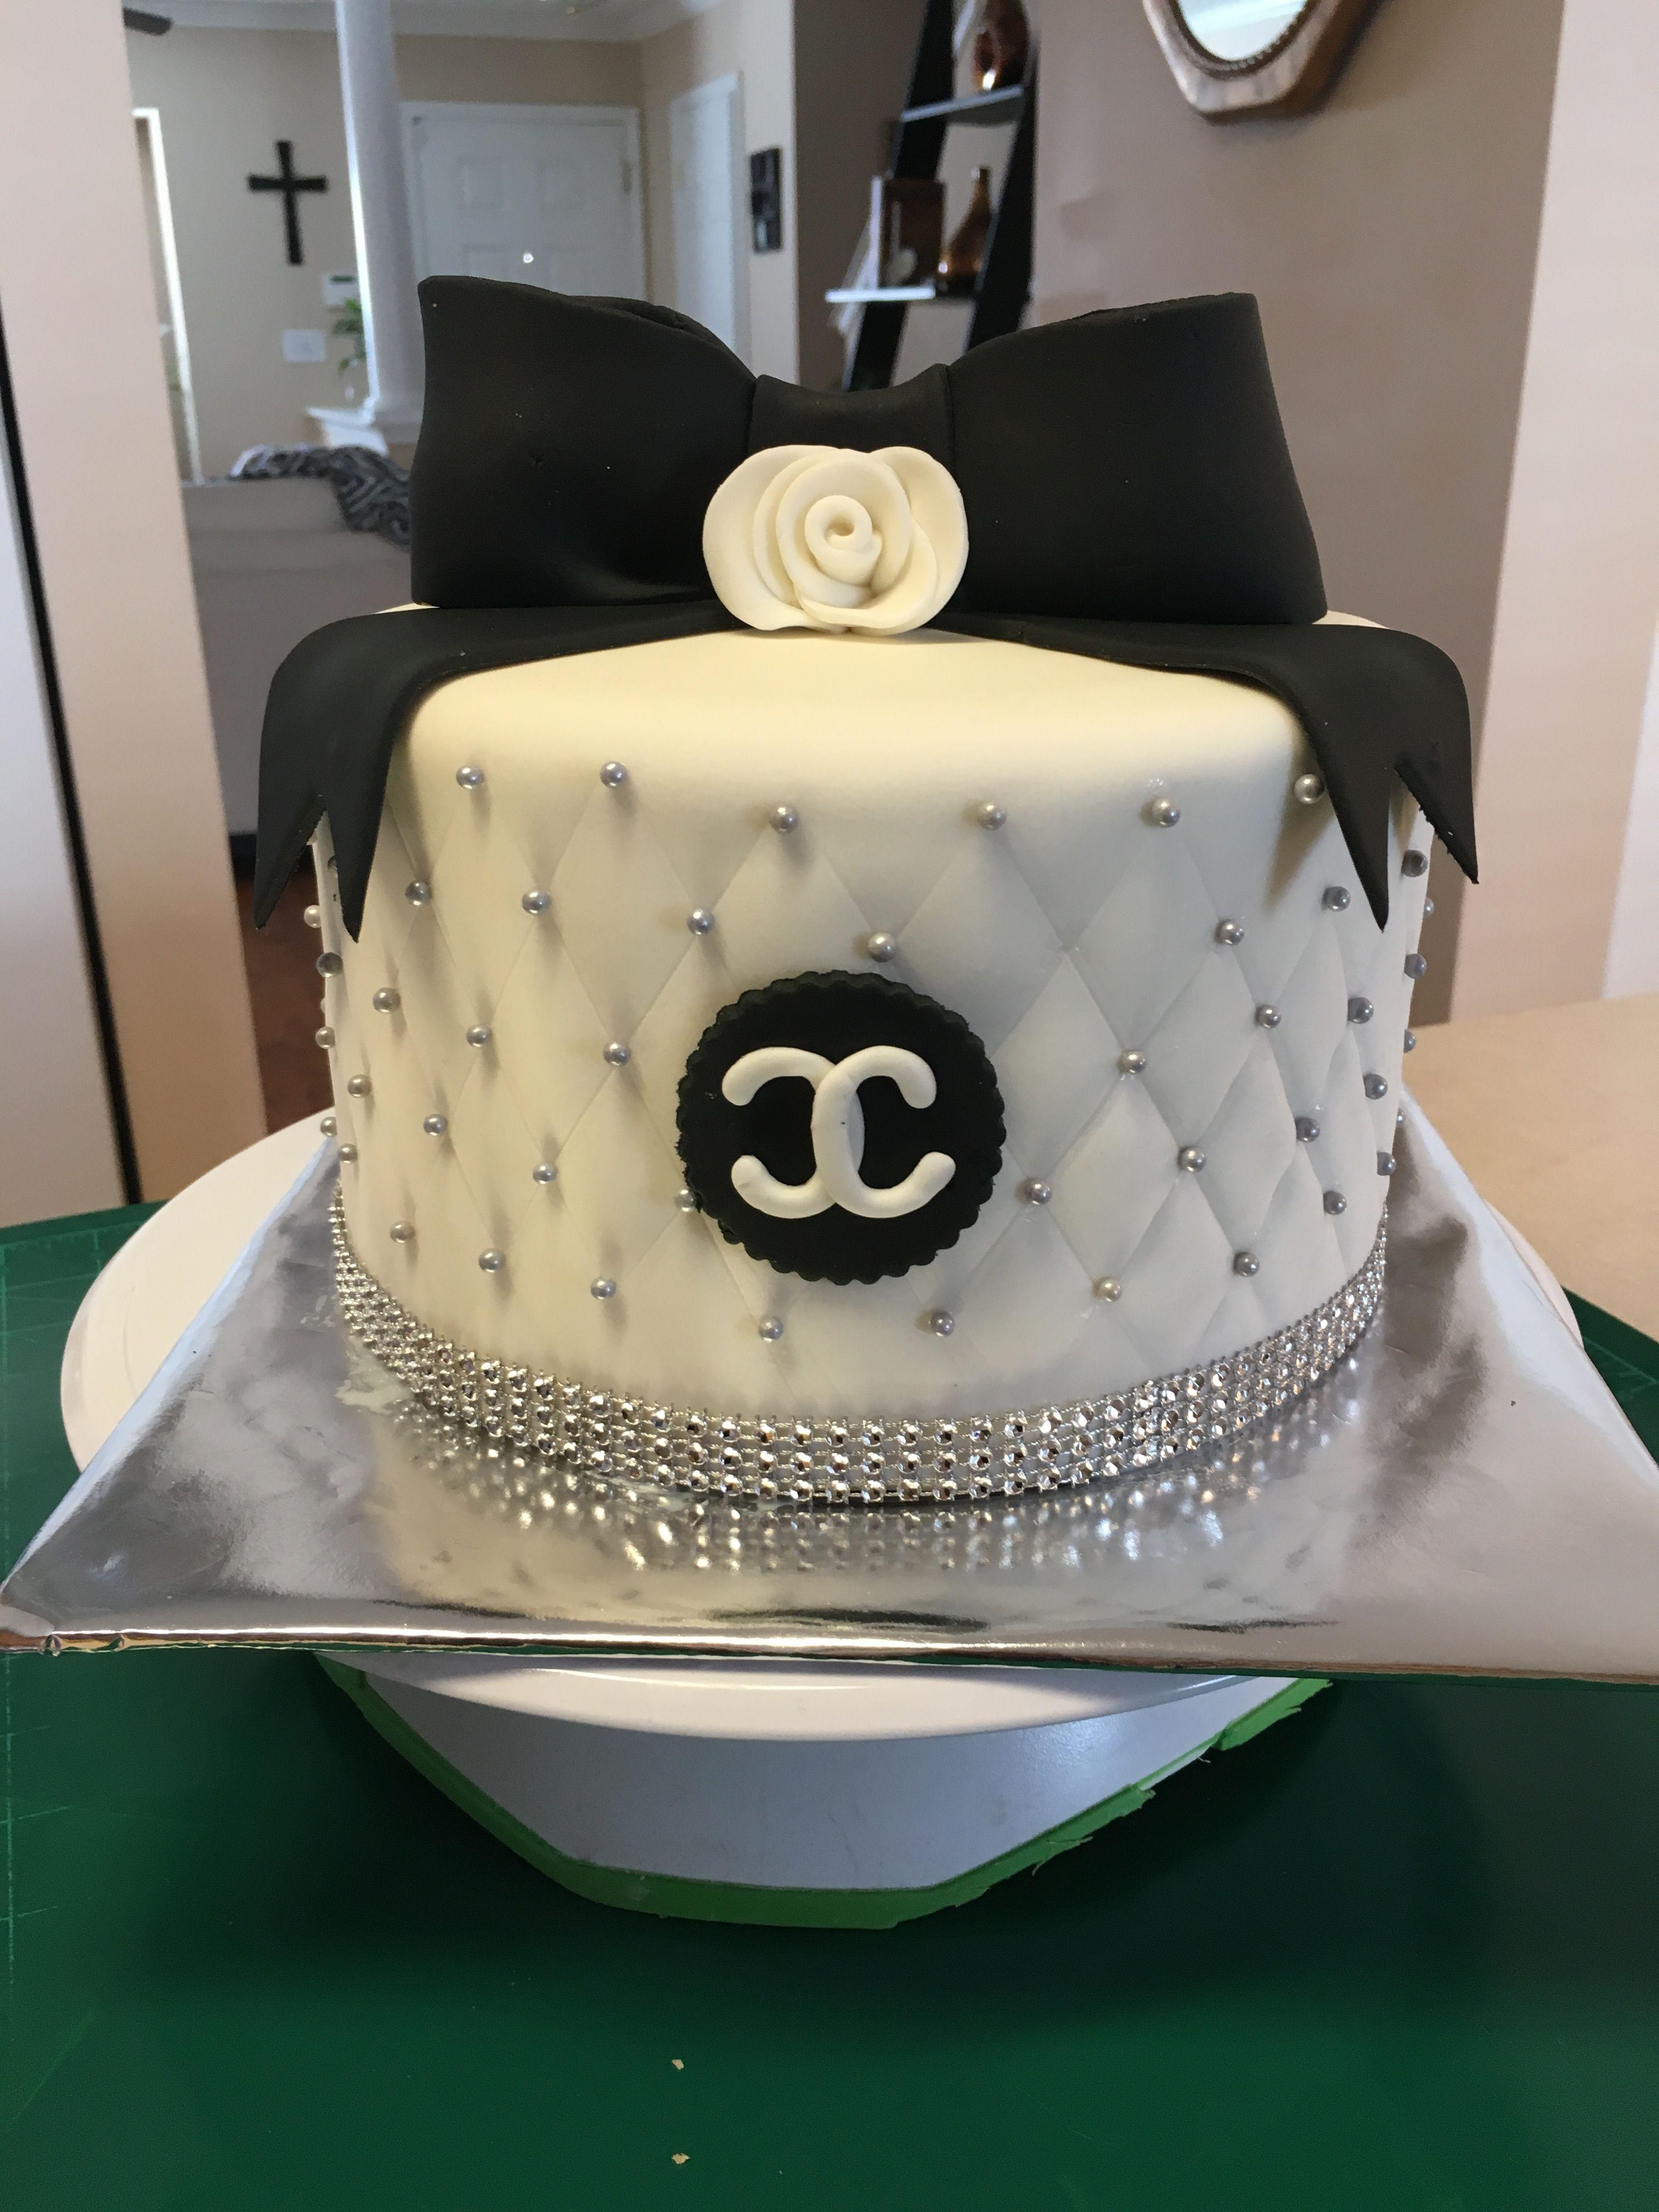 Chanel cake cake chanel cake desserts